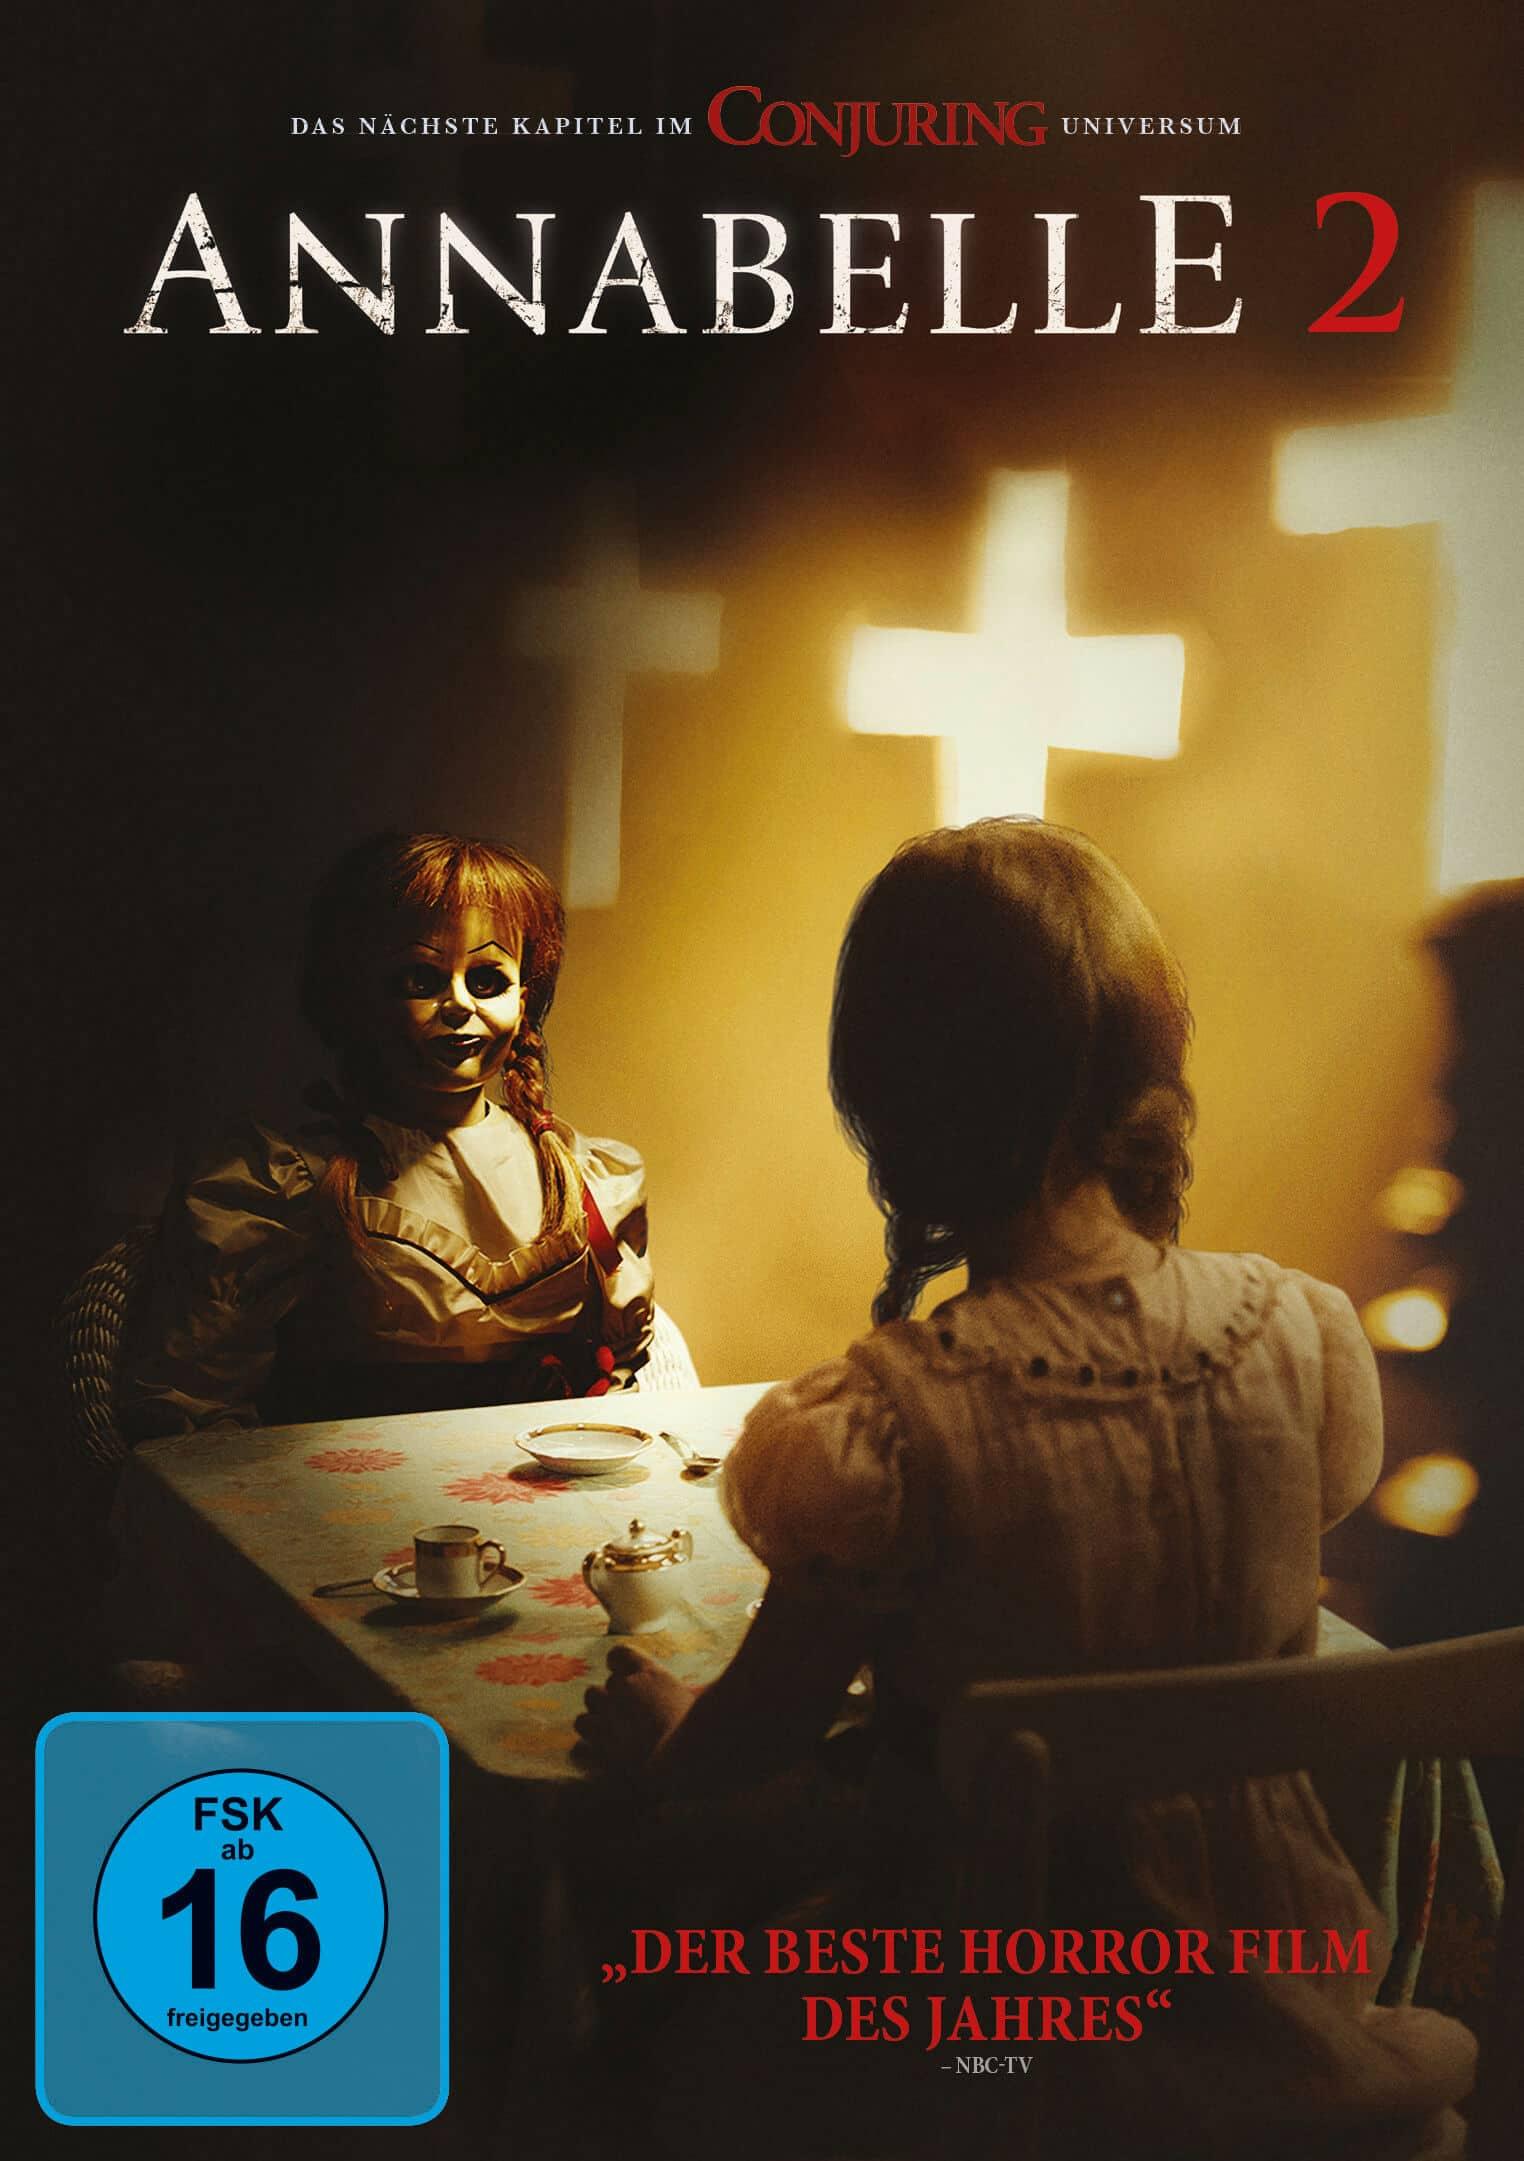 Annabelle 2 Kinostart Deutschland